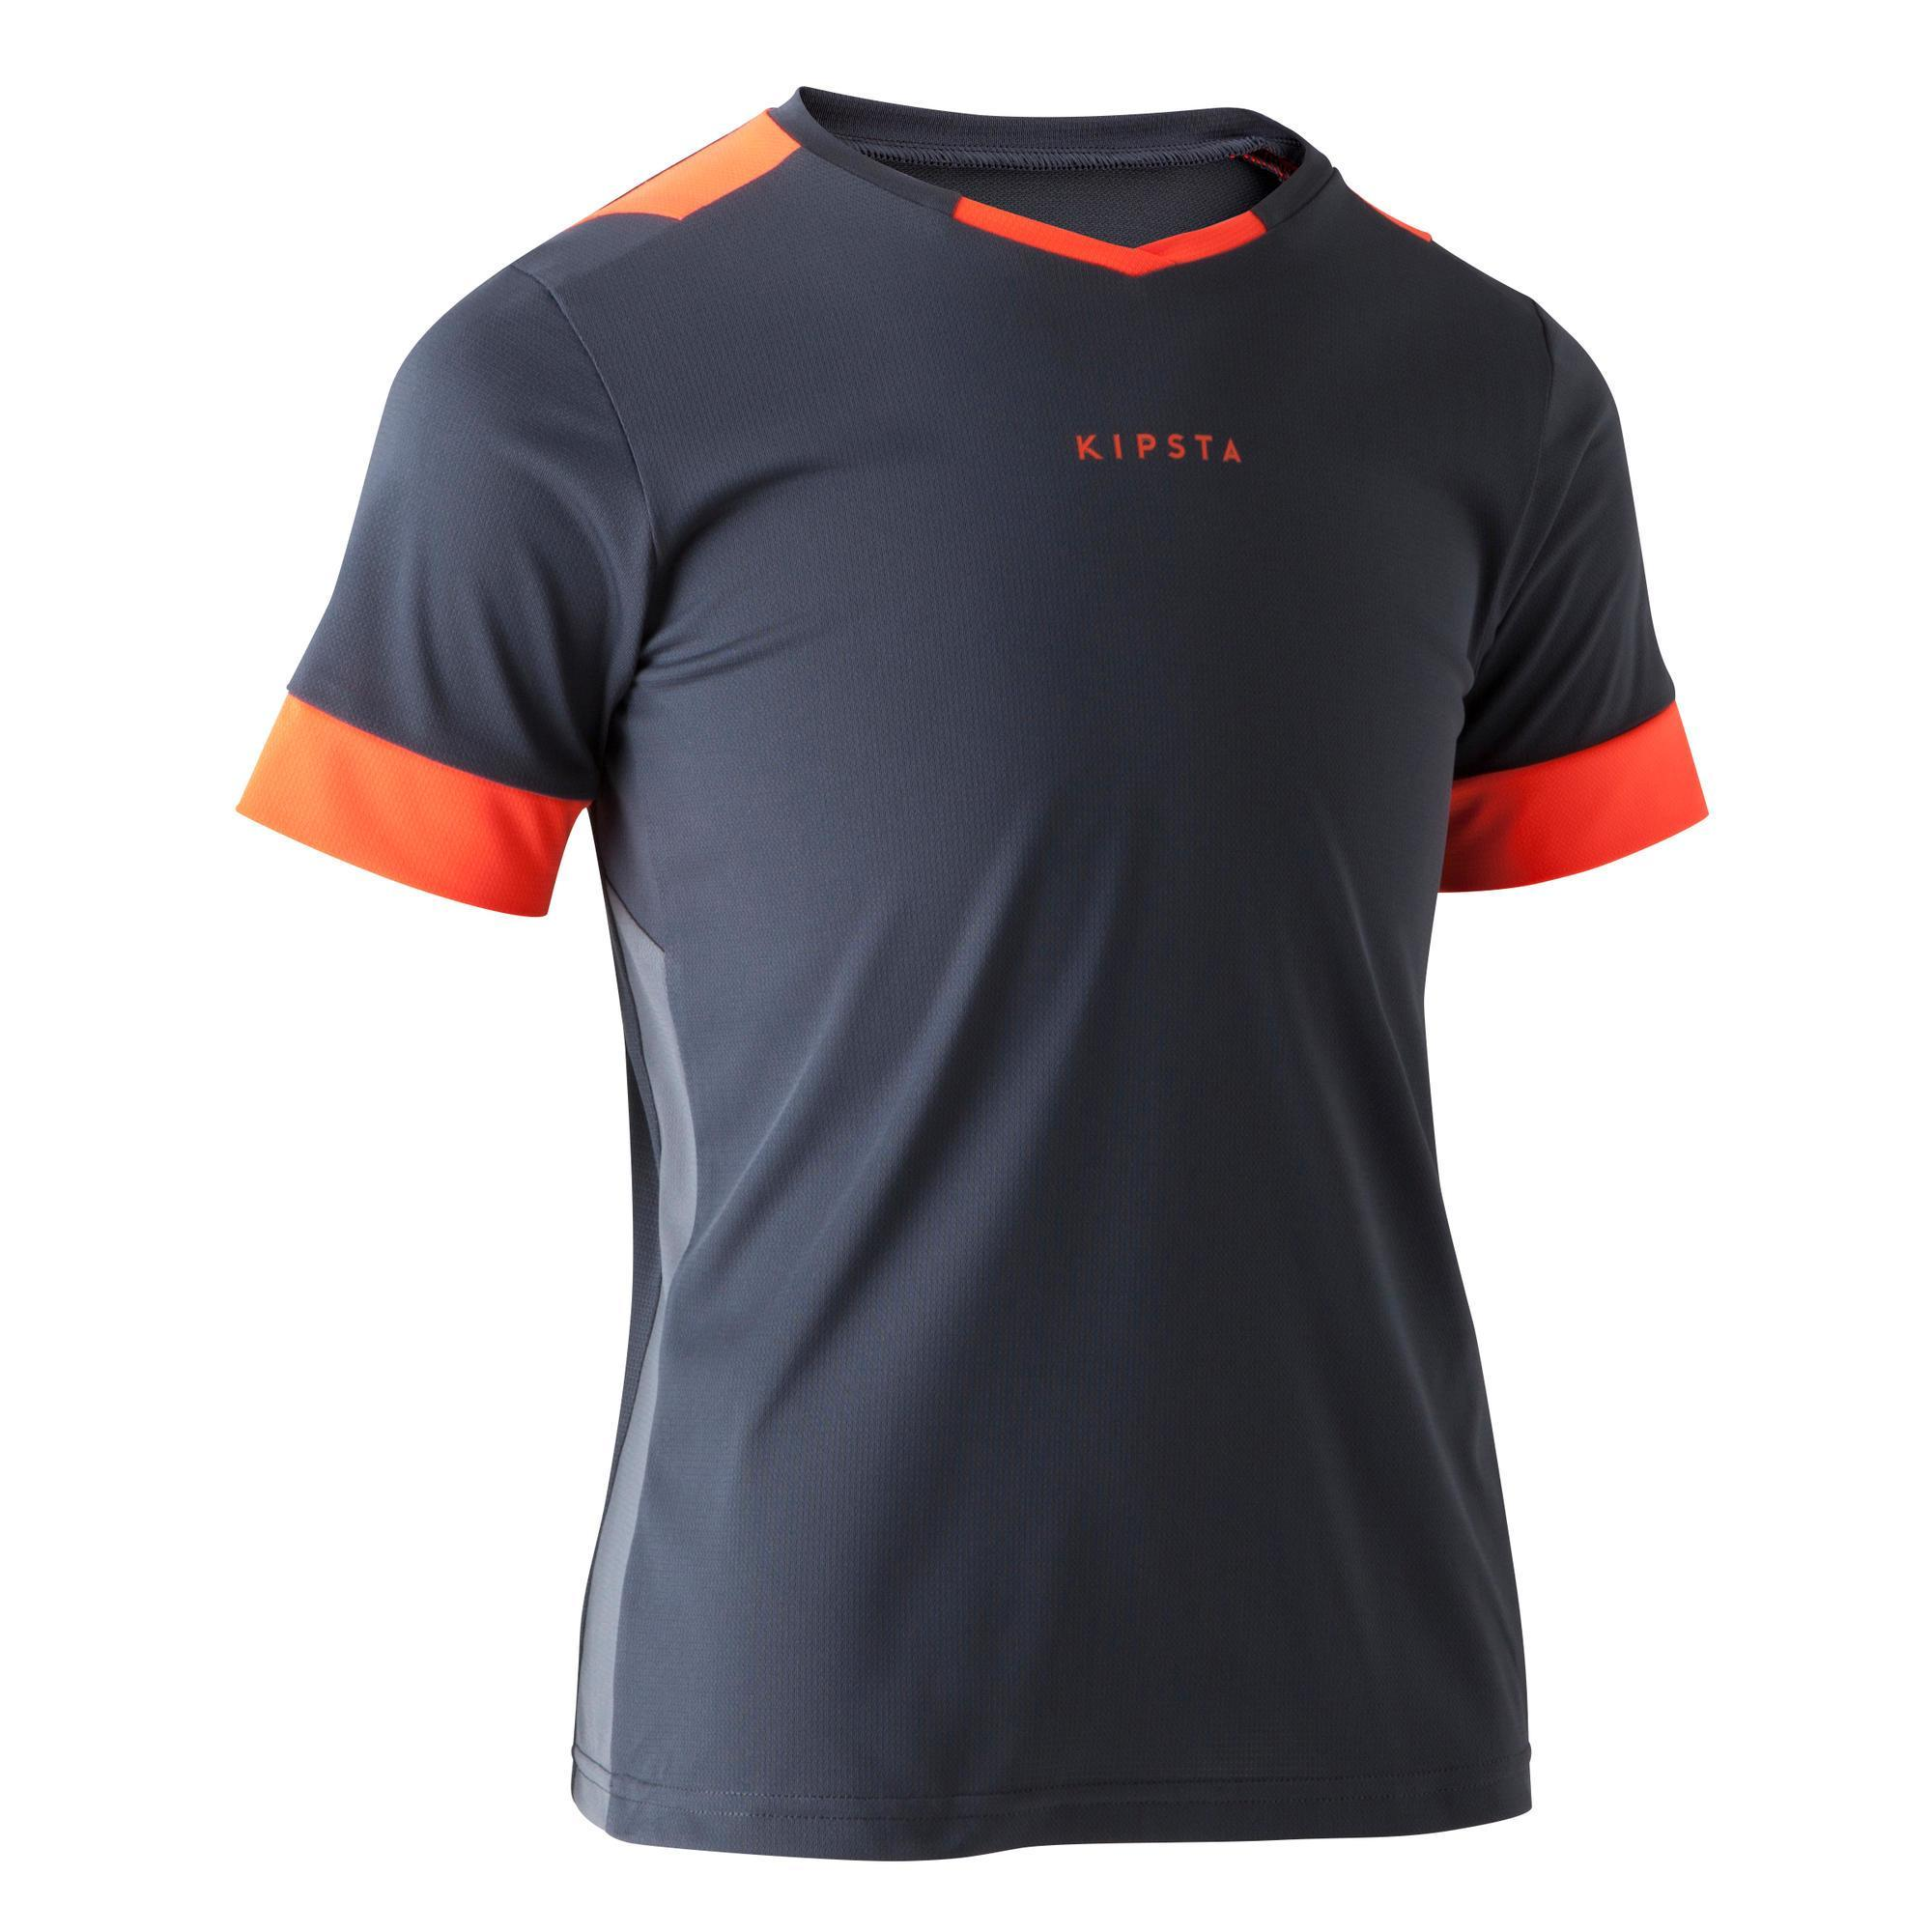 Comprar camisetas de fútbol para adultos niños decathlon jpg 2000x2000  Camiseta futbol letra deportes e387d9bac8ac4